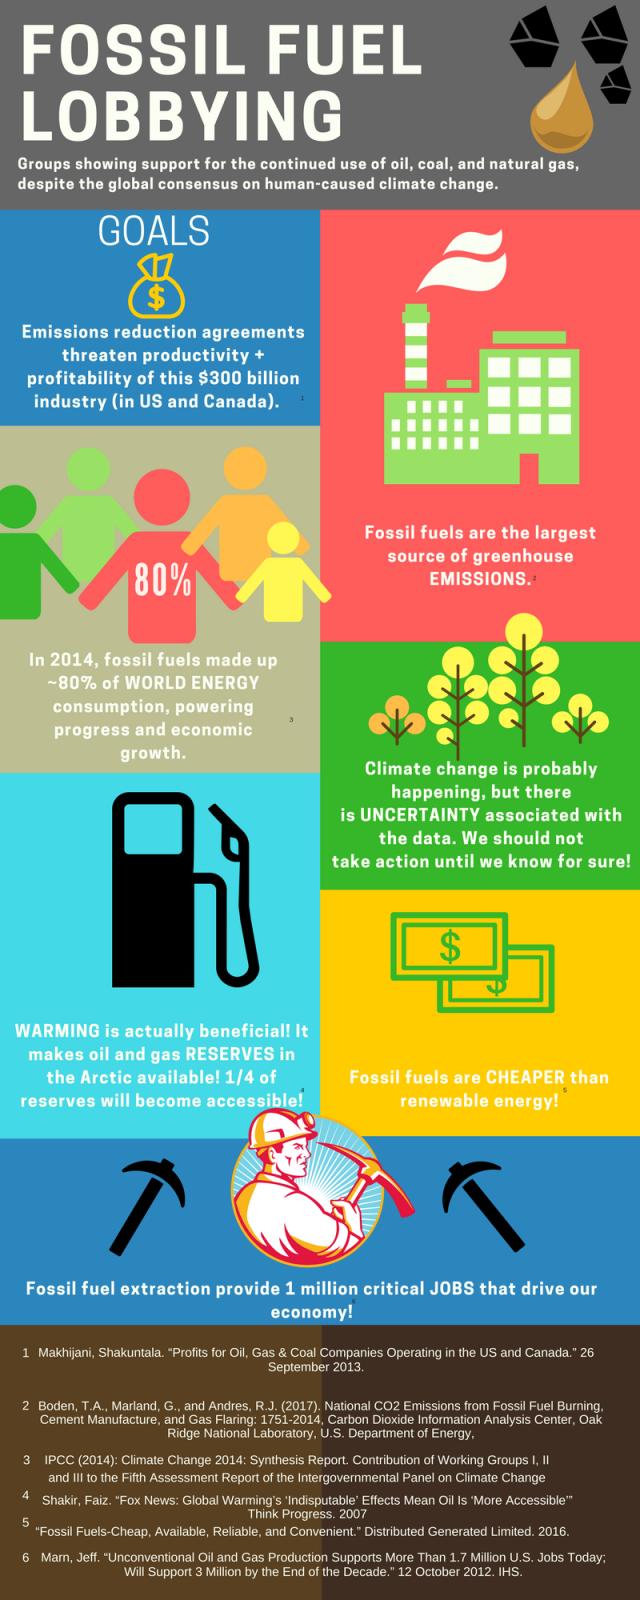 Fossil Fuel Lobbying(1)